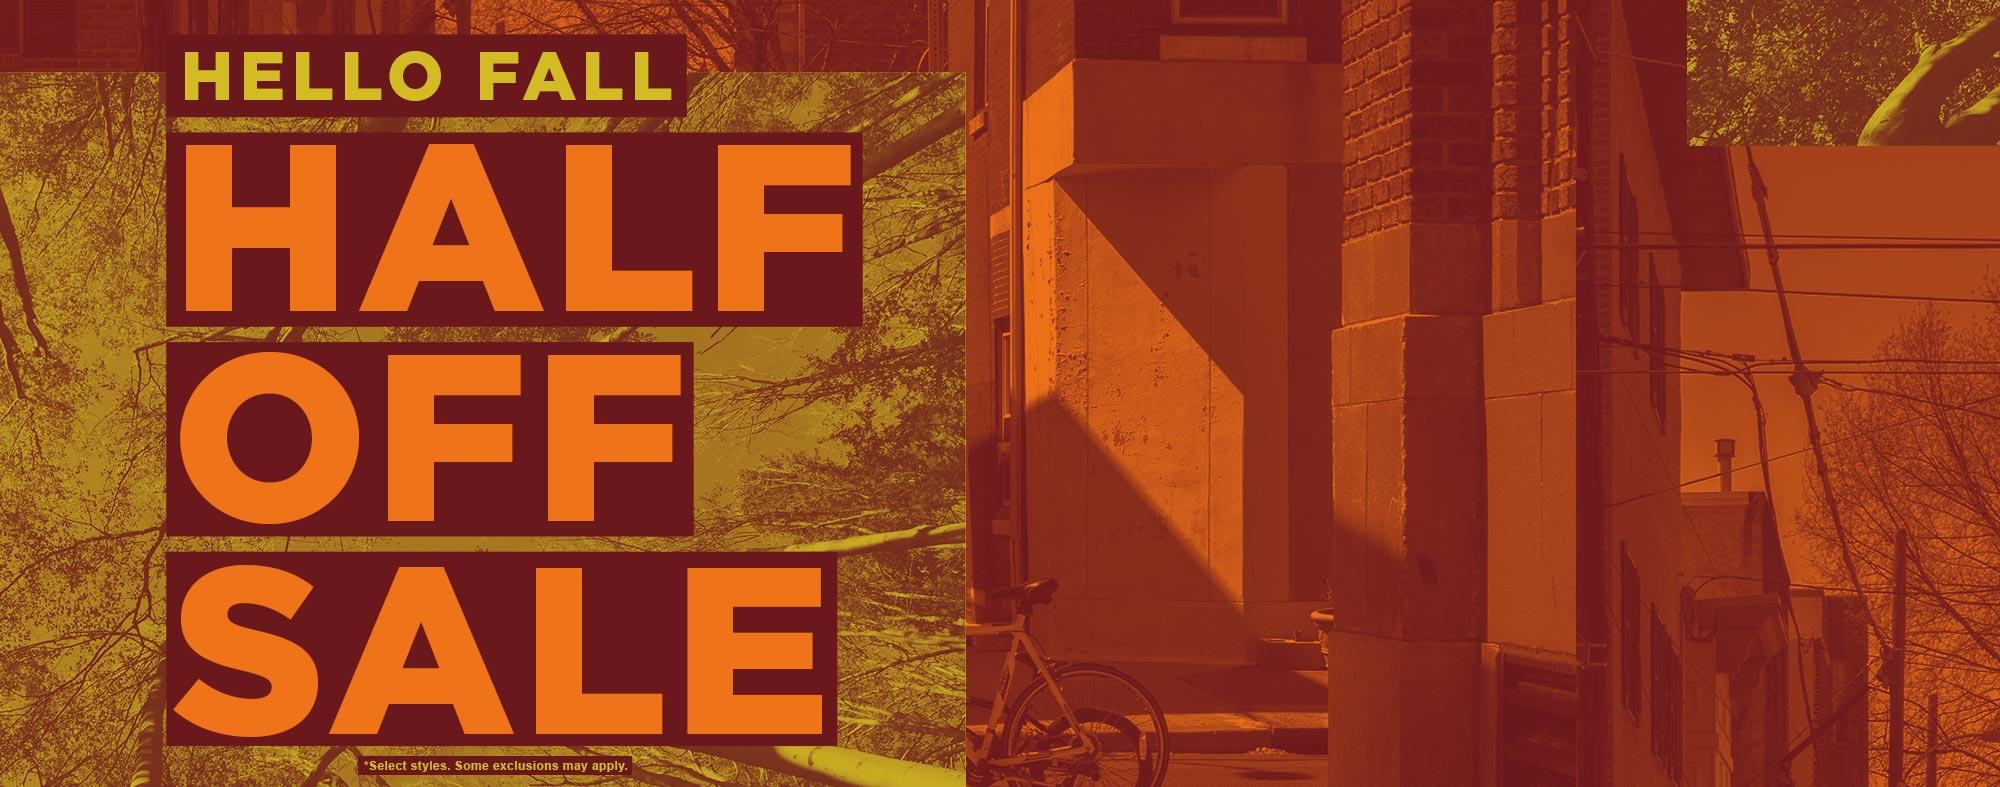 shop the fall sale